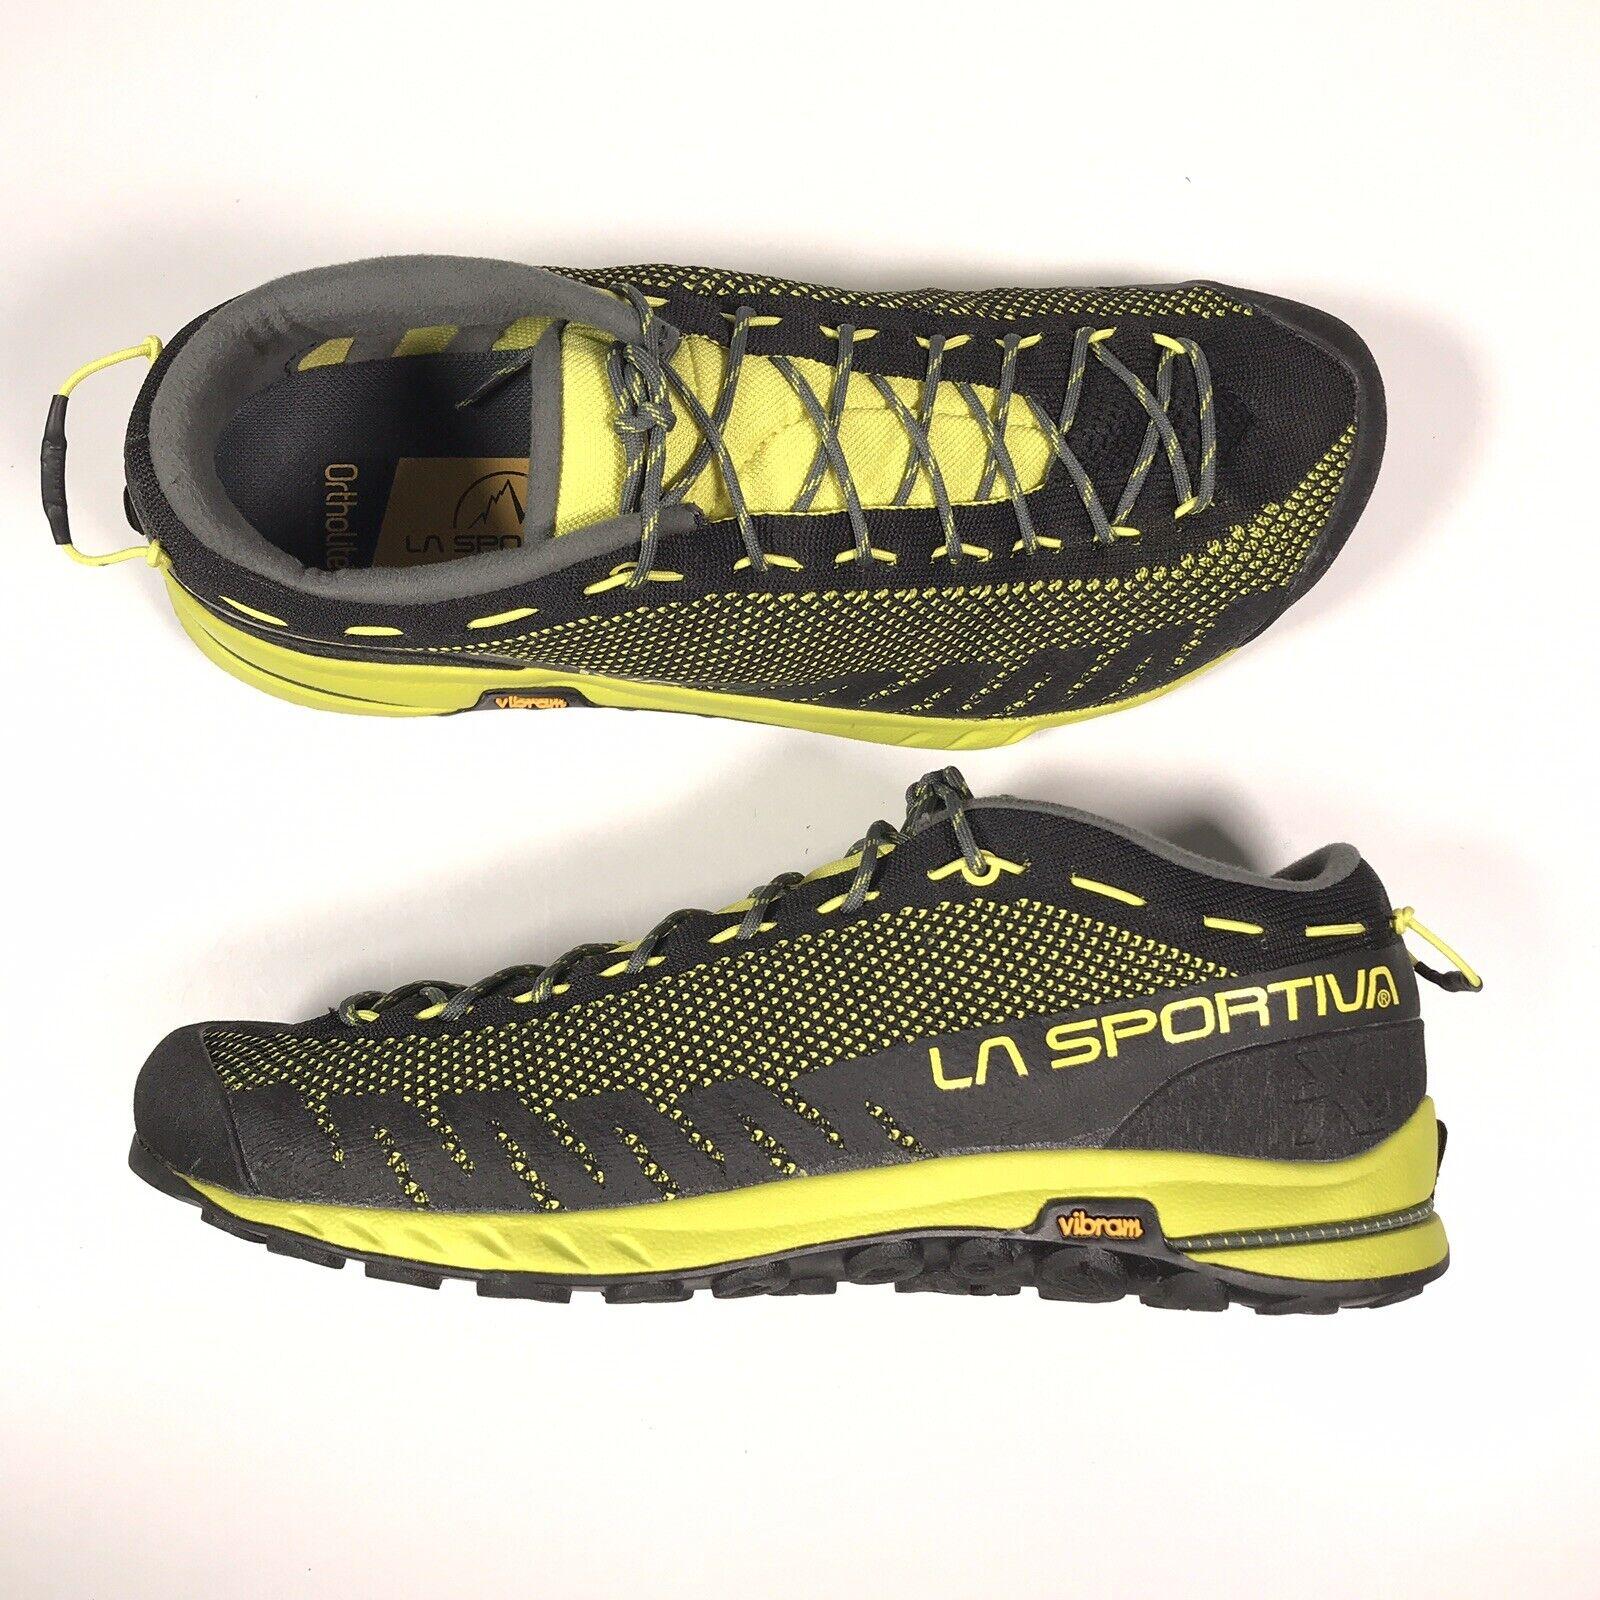 La Sportiva nos TX2 para hombre Mt. Escalada Senderismo Zapatos Negro Amarillo nos